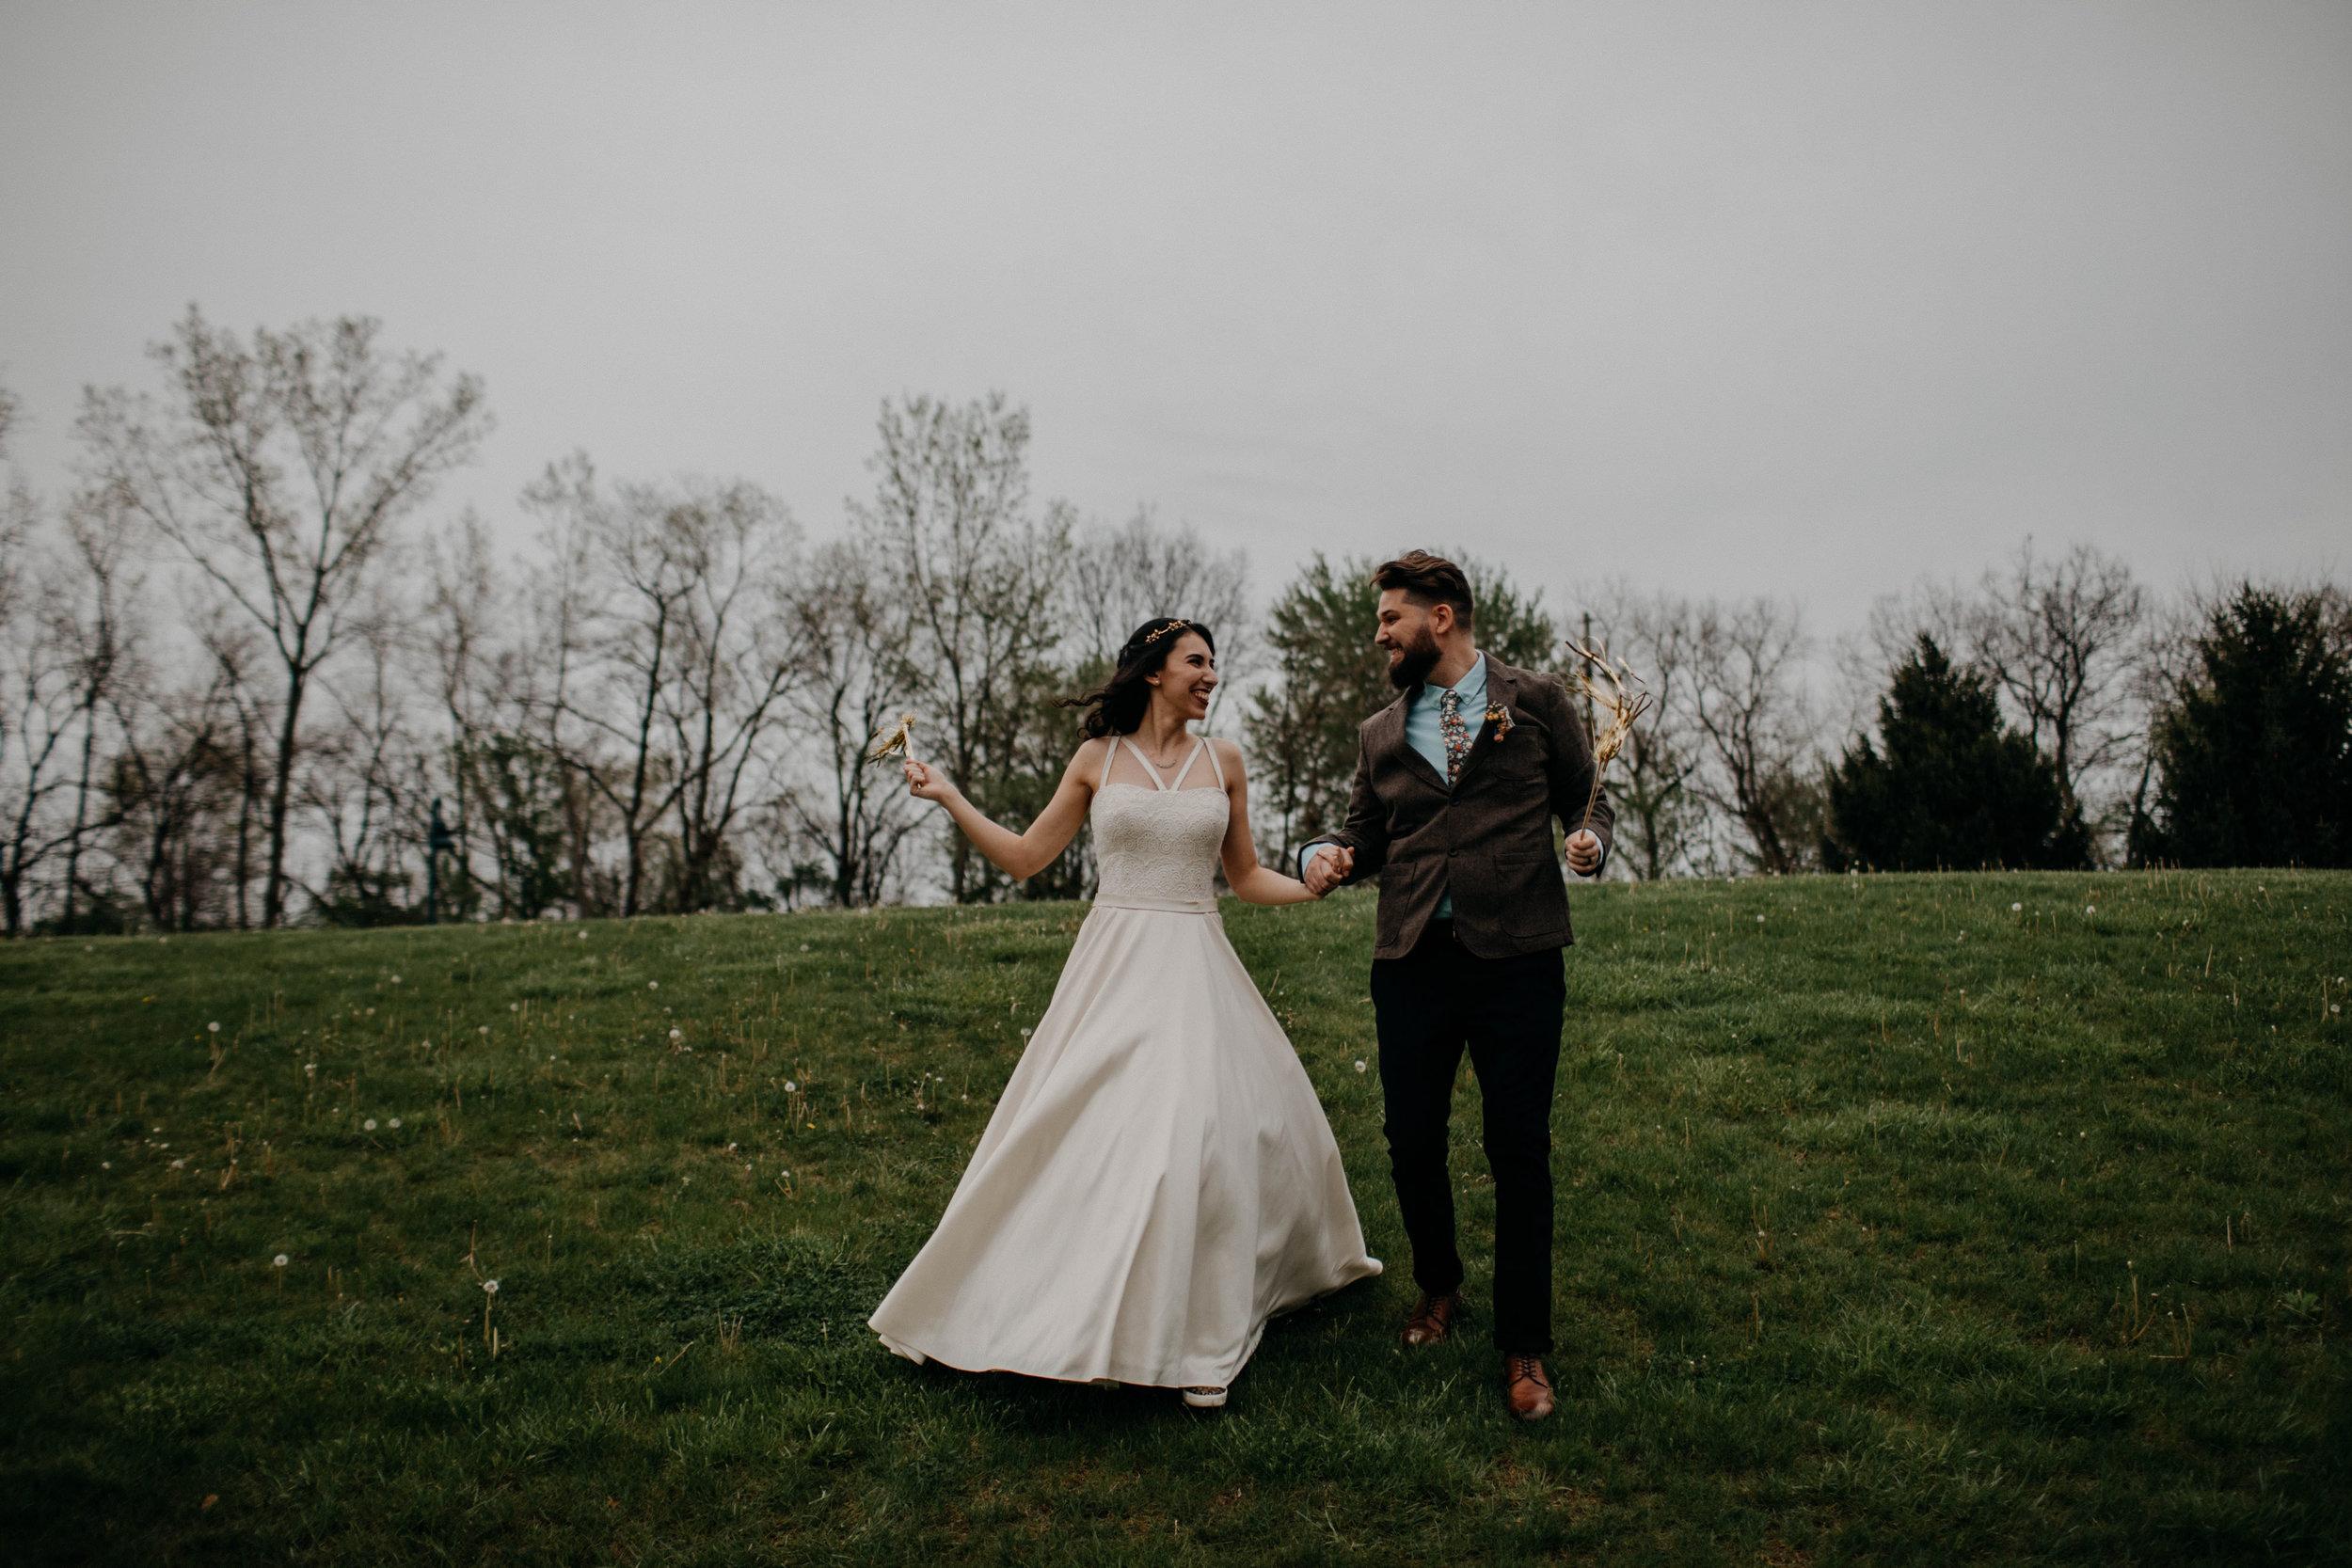 Columbus, Ohio Wedding Photographer Everal Barn At Heritage Park Wedding Venue Grace E Jones Photography175.jpg